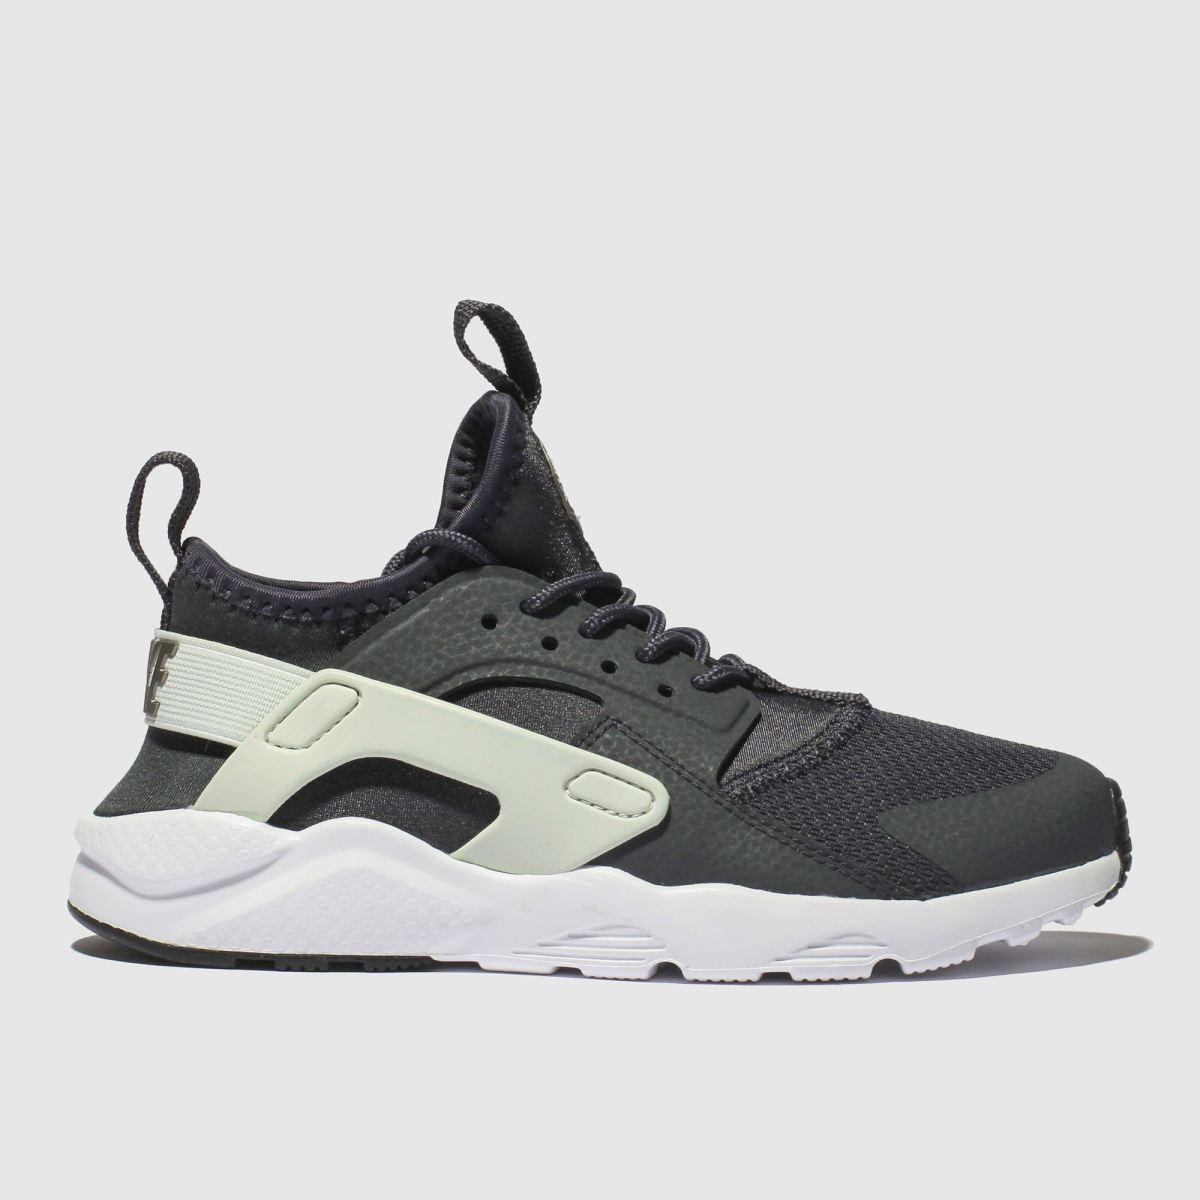 Nike Dark Grey Huarache Run Ultra Trainers Junior